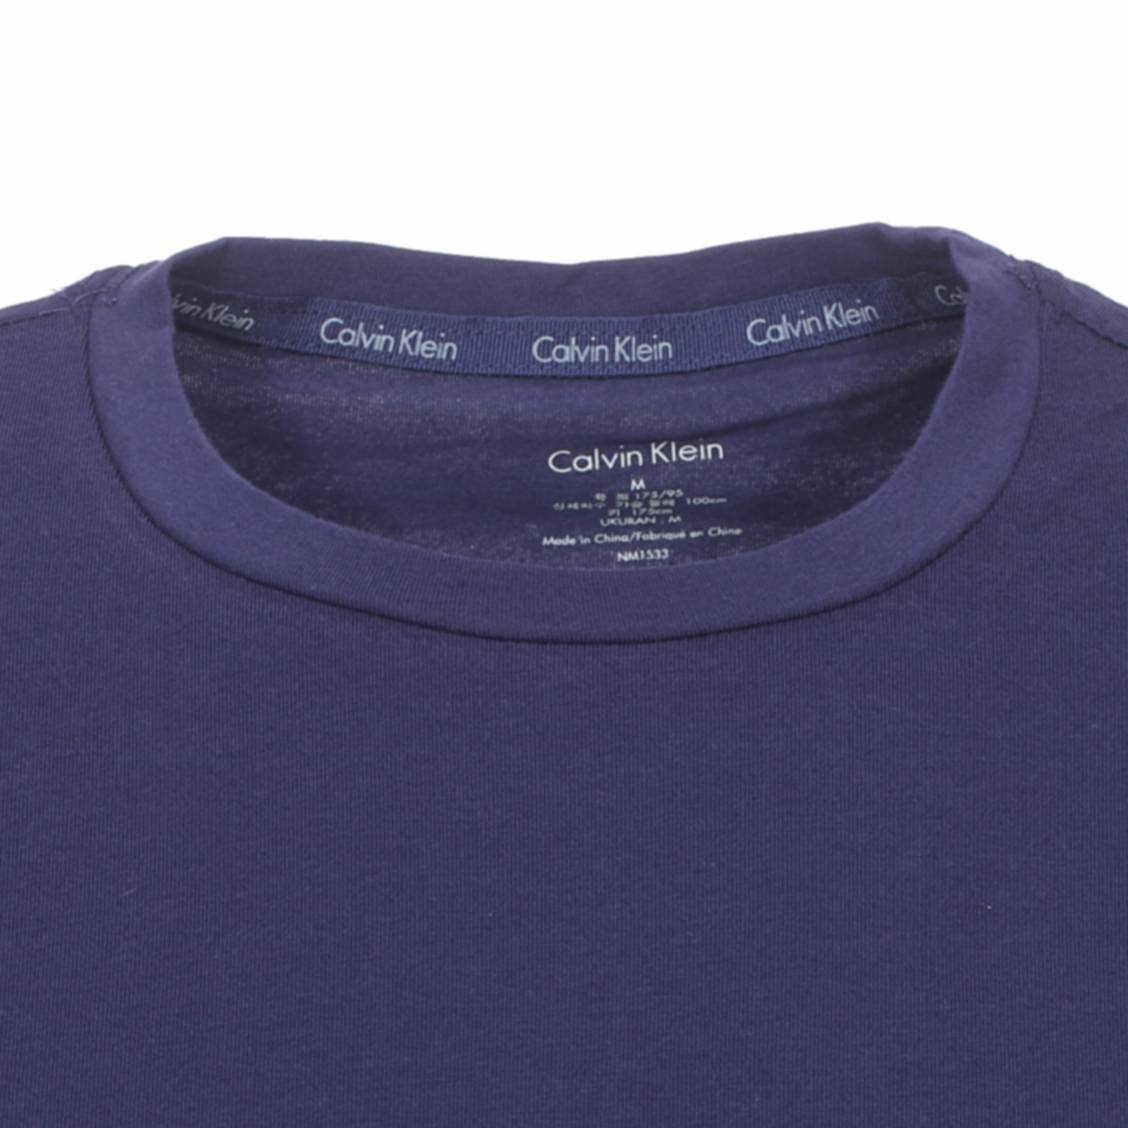 53f7cf36728 ... Pyjama court Short Set Calvin Klein   tee-shirt col rond bleu marine en  coton ...